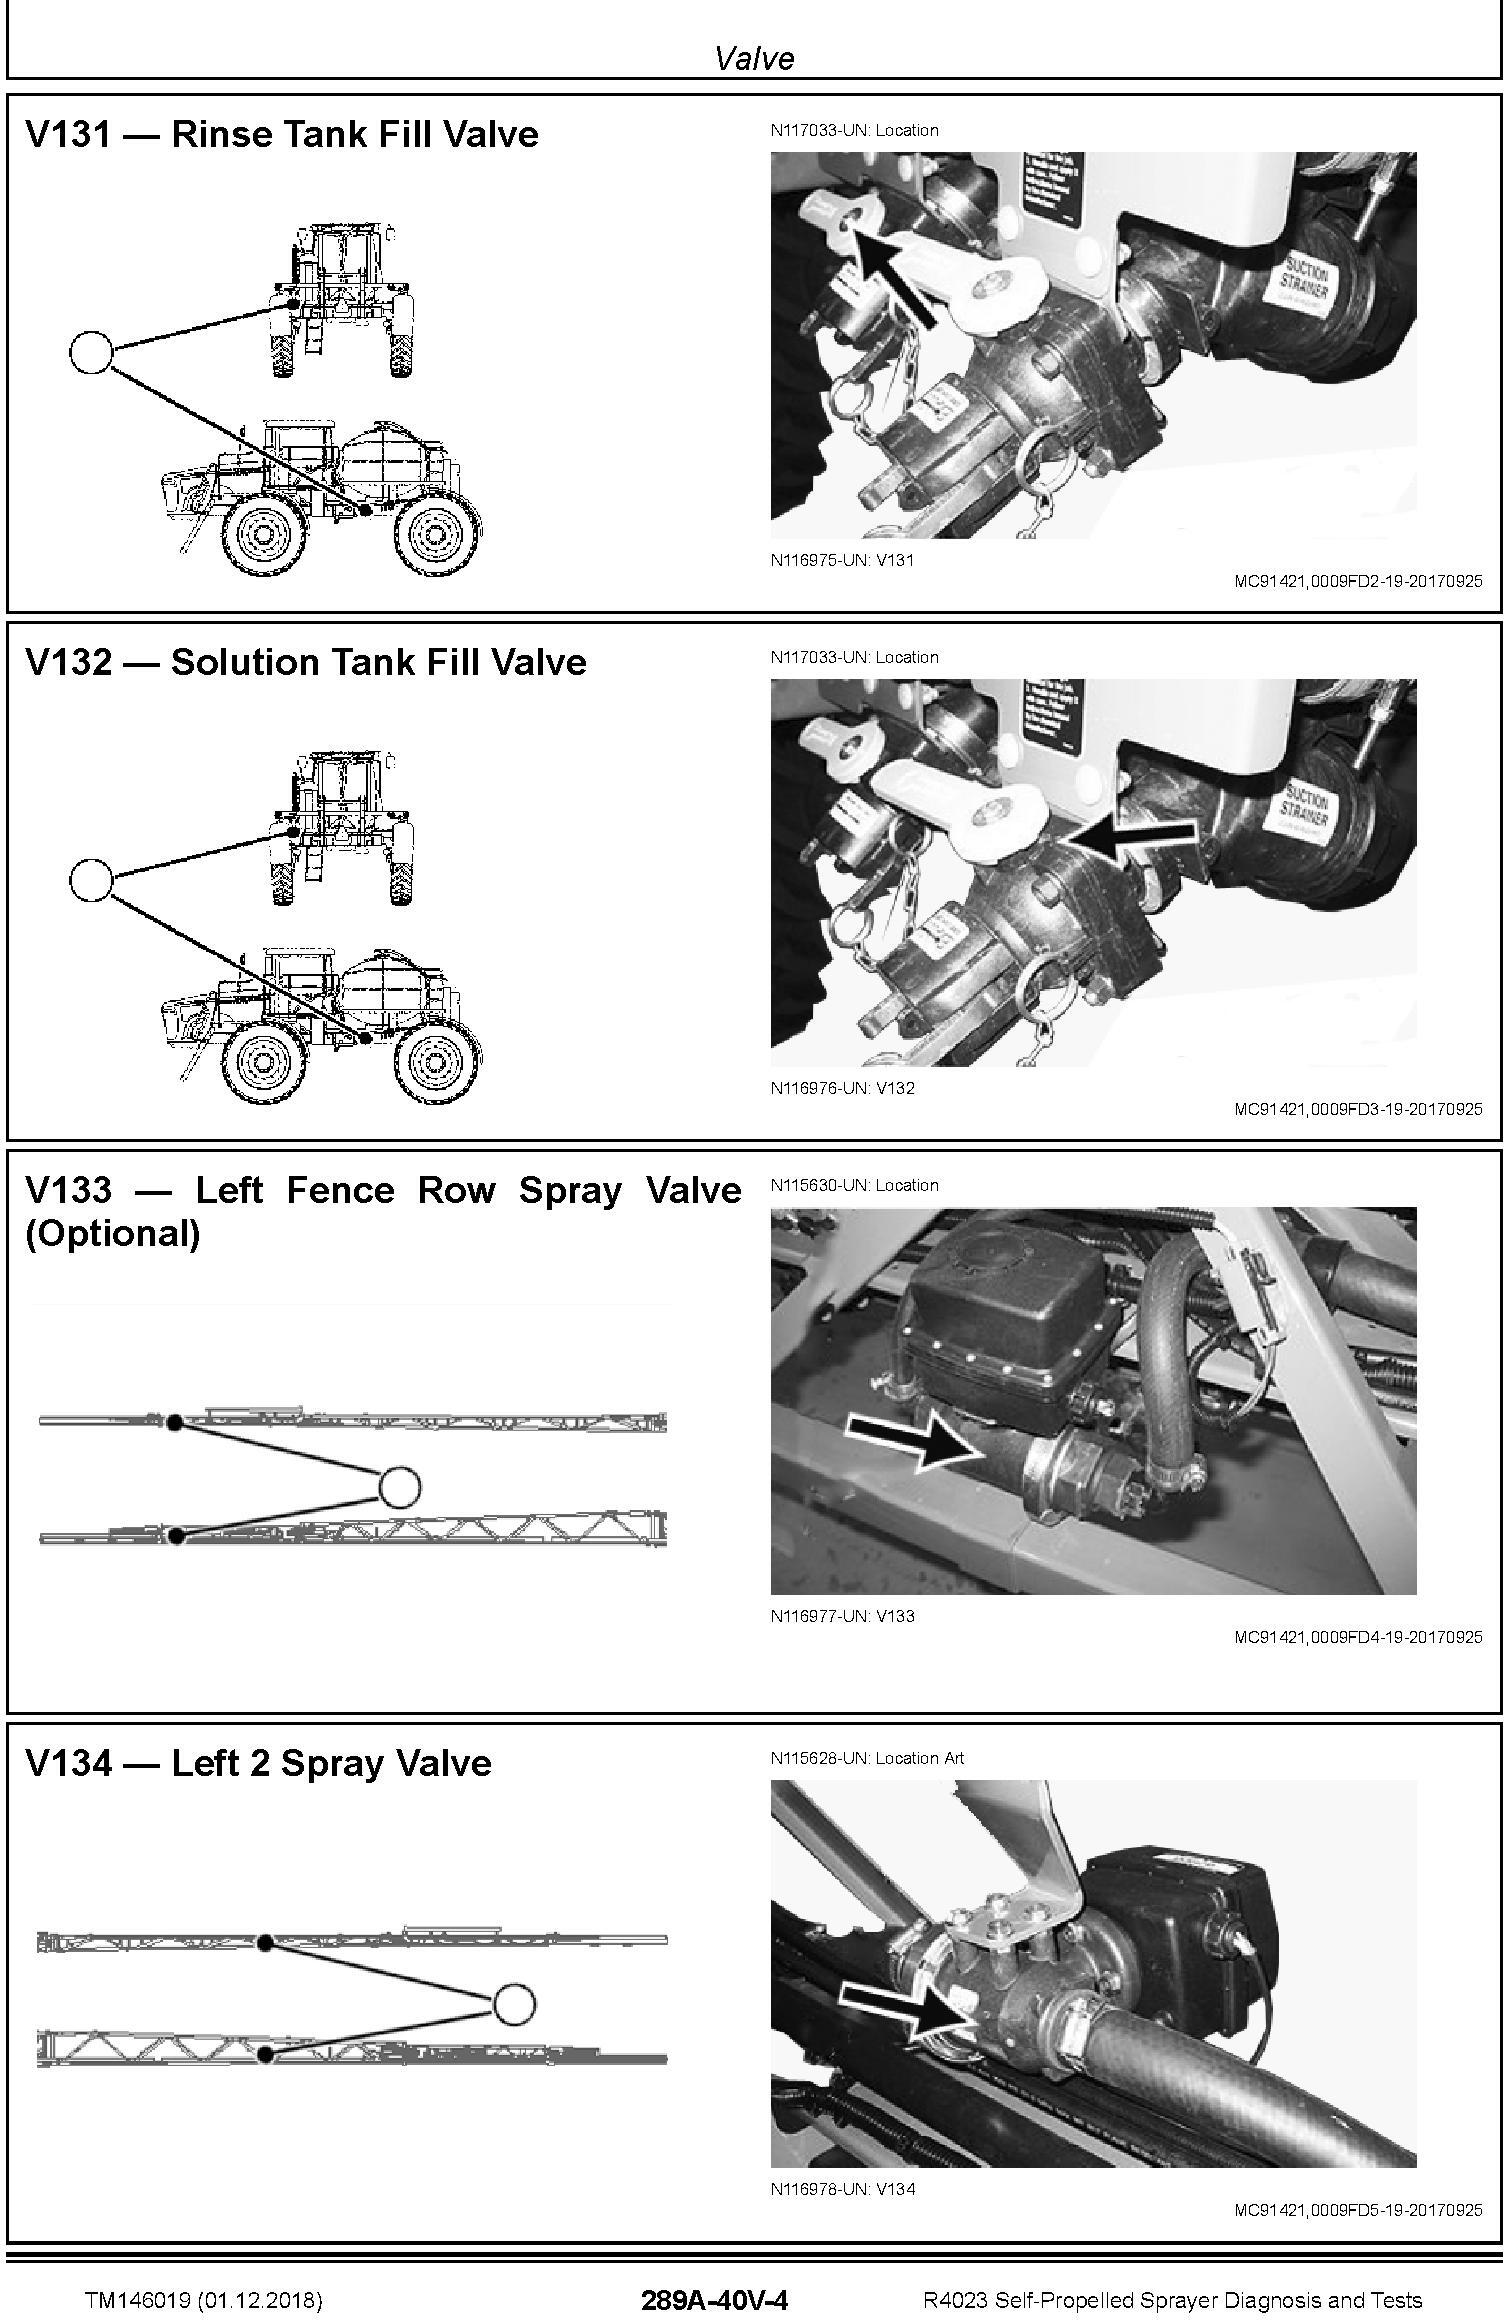 John Deere R4023 Self-Propelled Sprayer (SN. 180001-) Diagnostic Technical Manual (TM146019) - 3